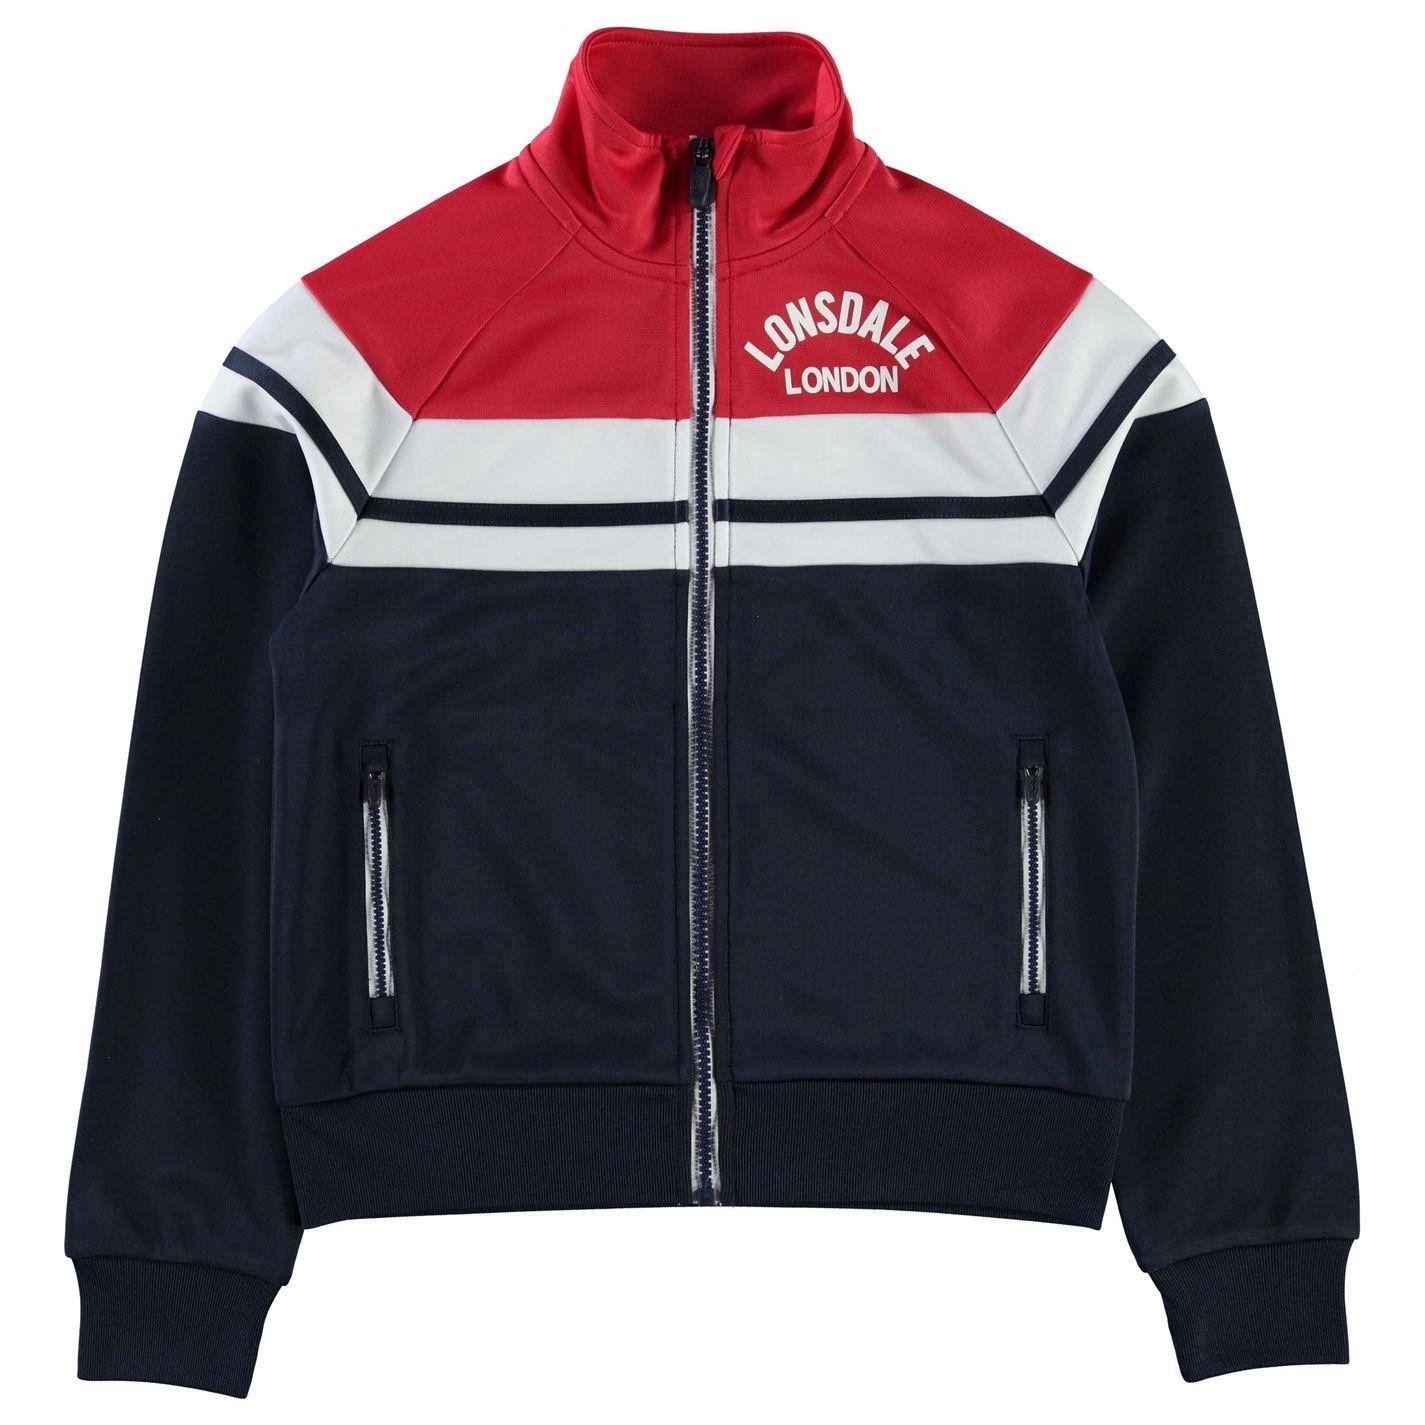 Lonsdale Kids Boys Retro Jacket Junior Tracksuit Top Coat Funnel Neck Zip Full